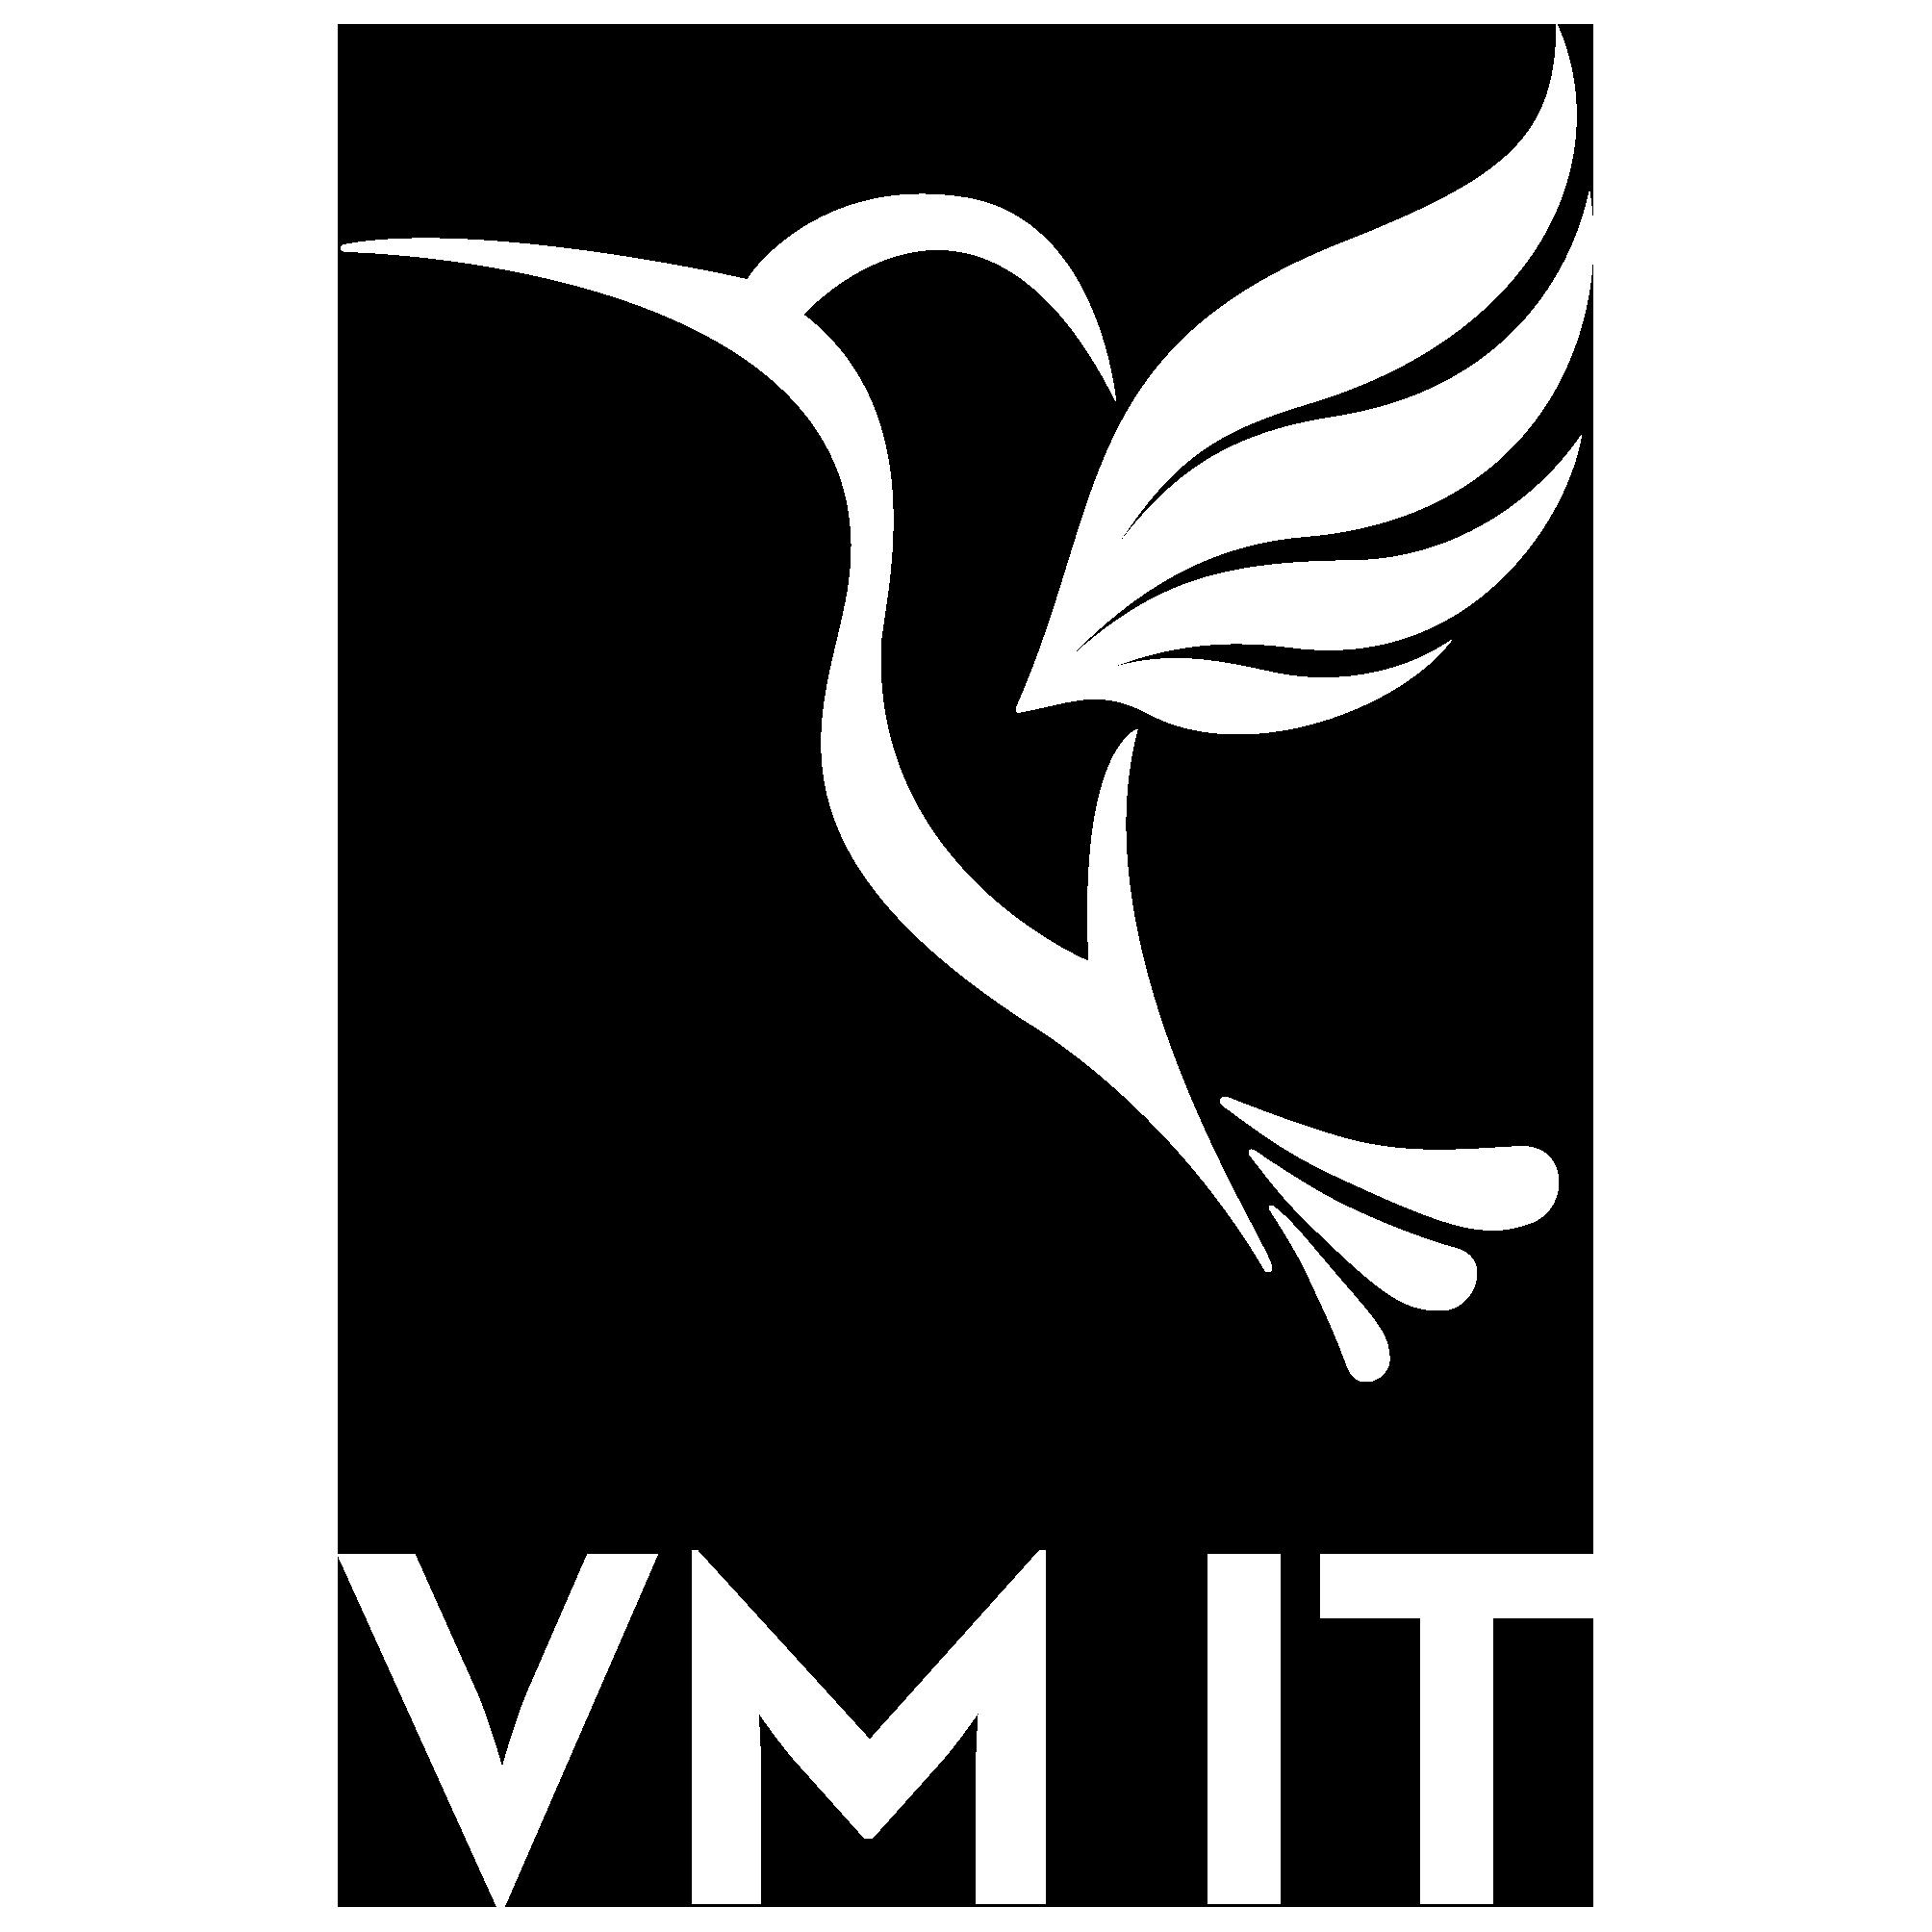 VMIT_nega_kolibri-1